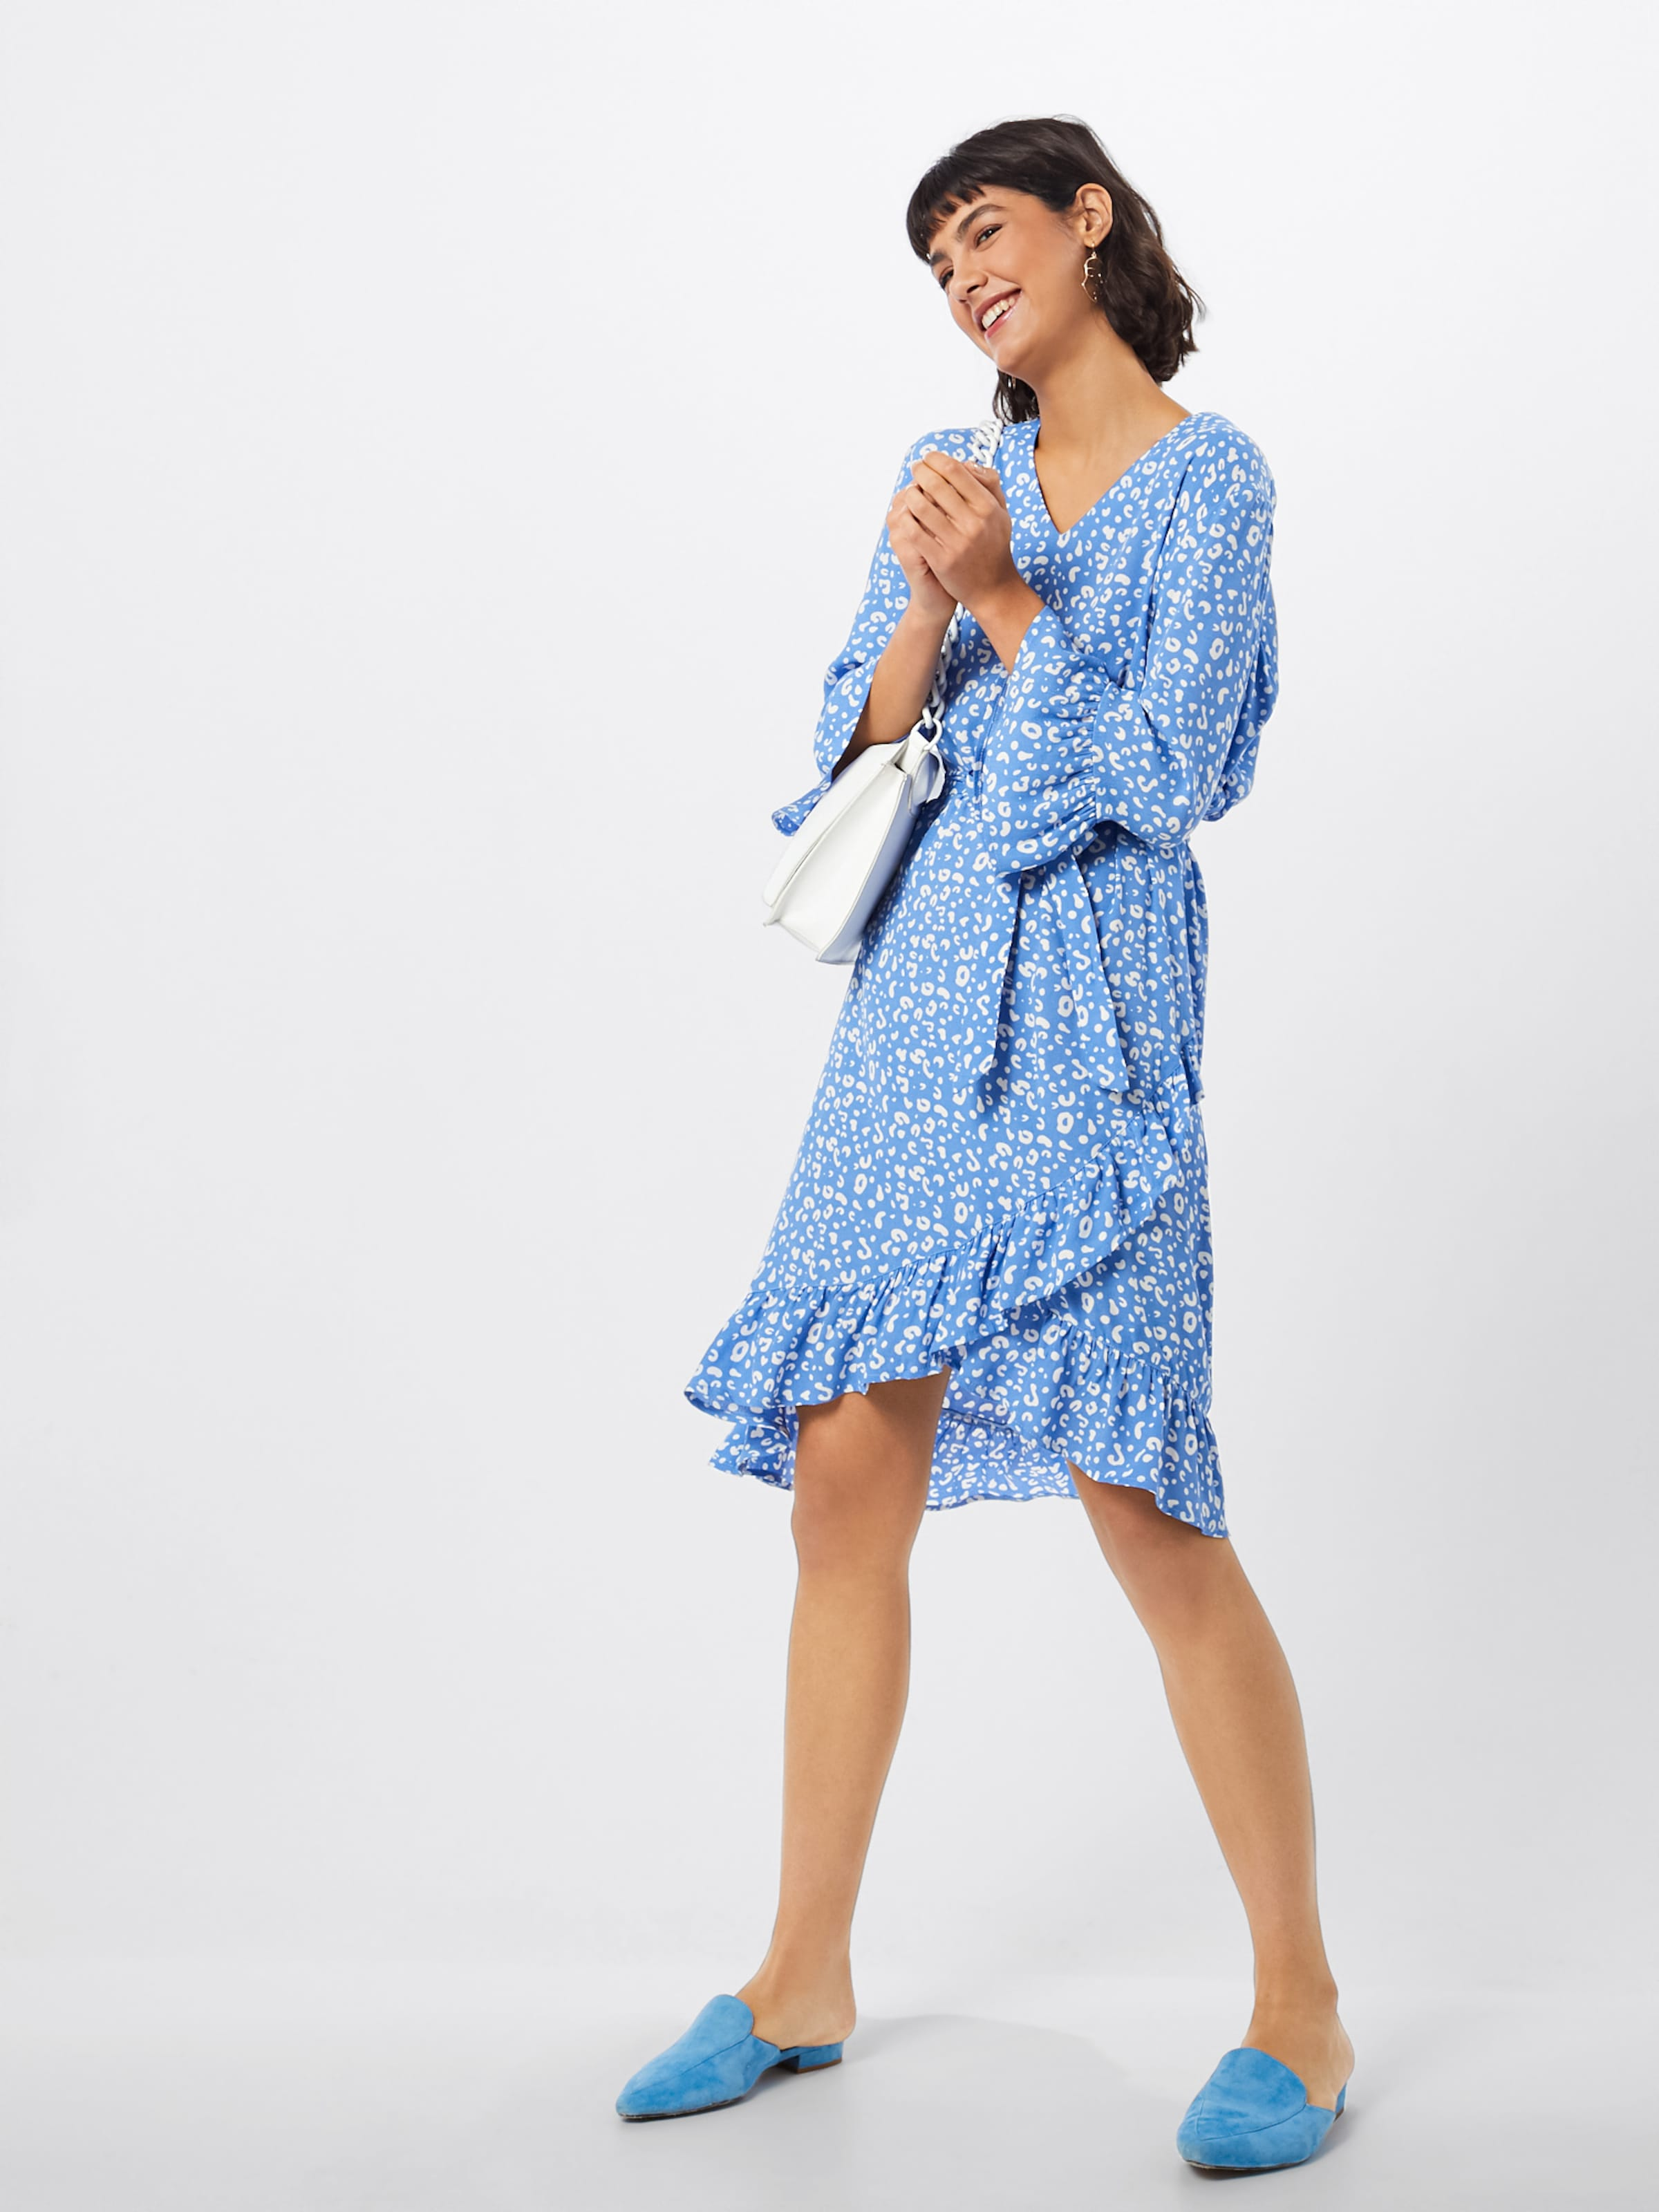 ClairBlanc Robe D'été Bleu Tropez Saint En j5A4RL